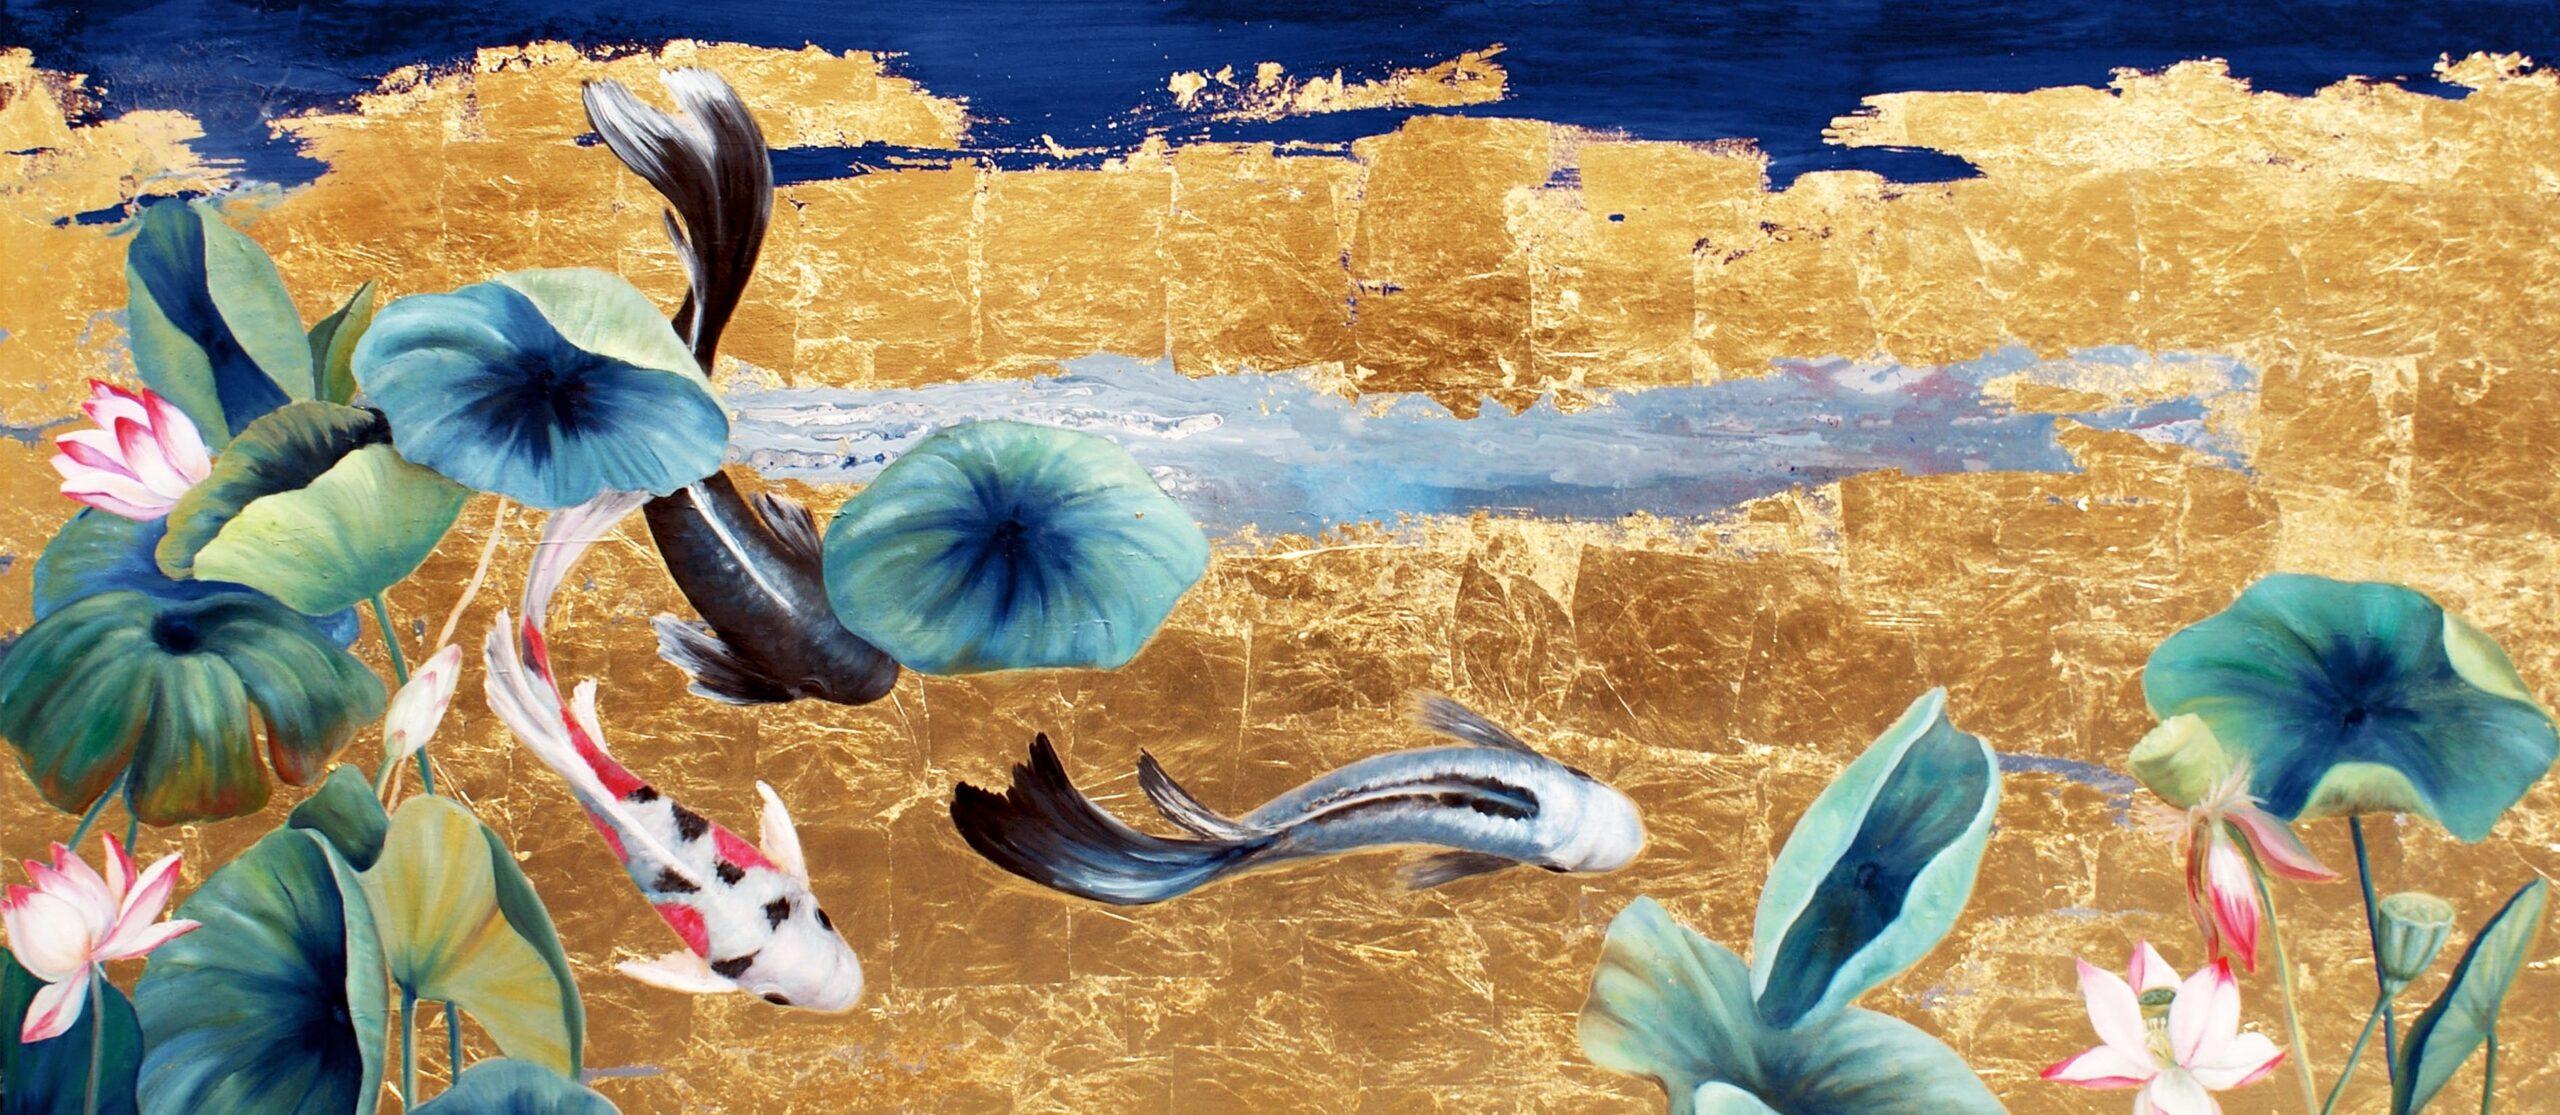 PICTOCLUB Painting - Esther Moreno